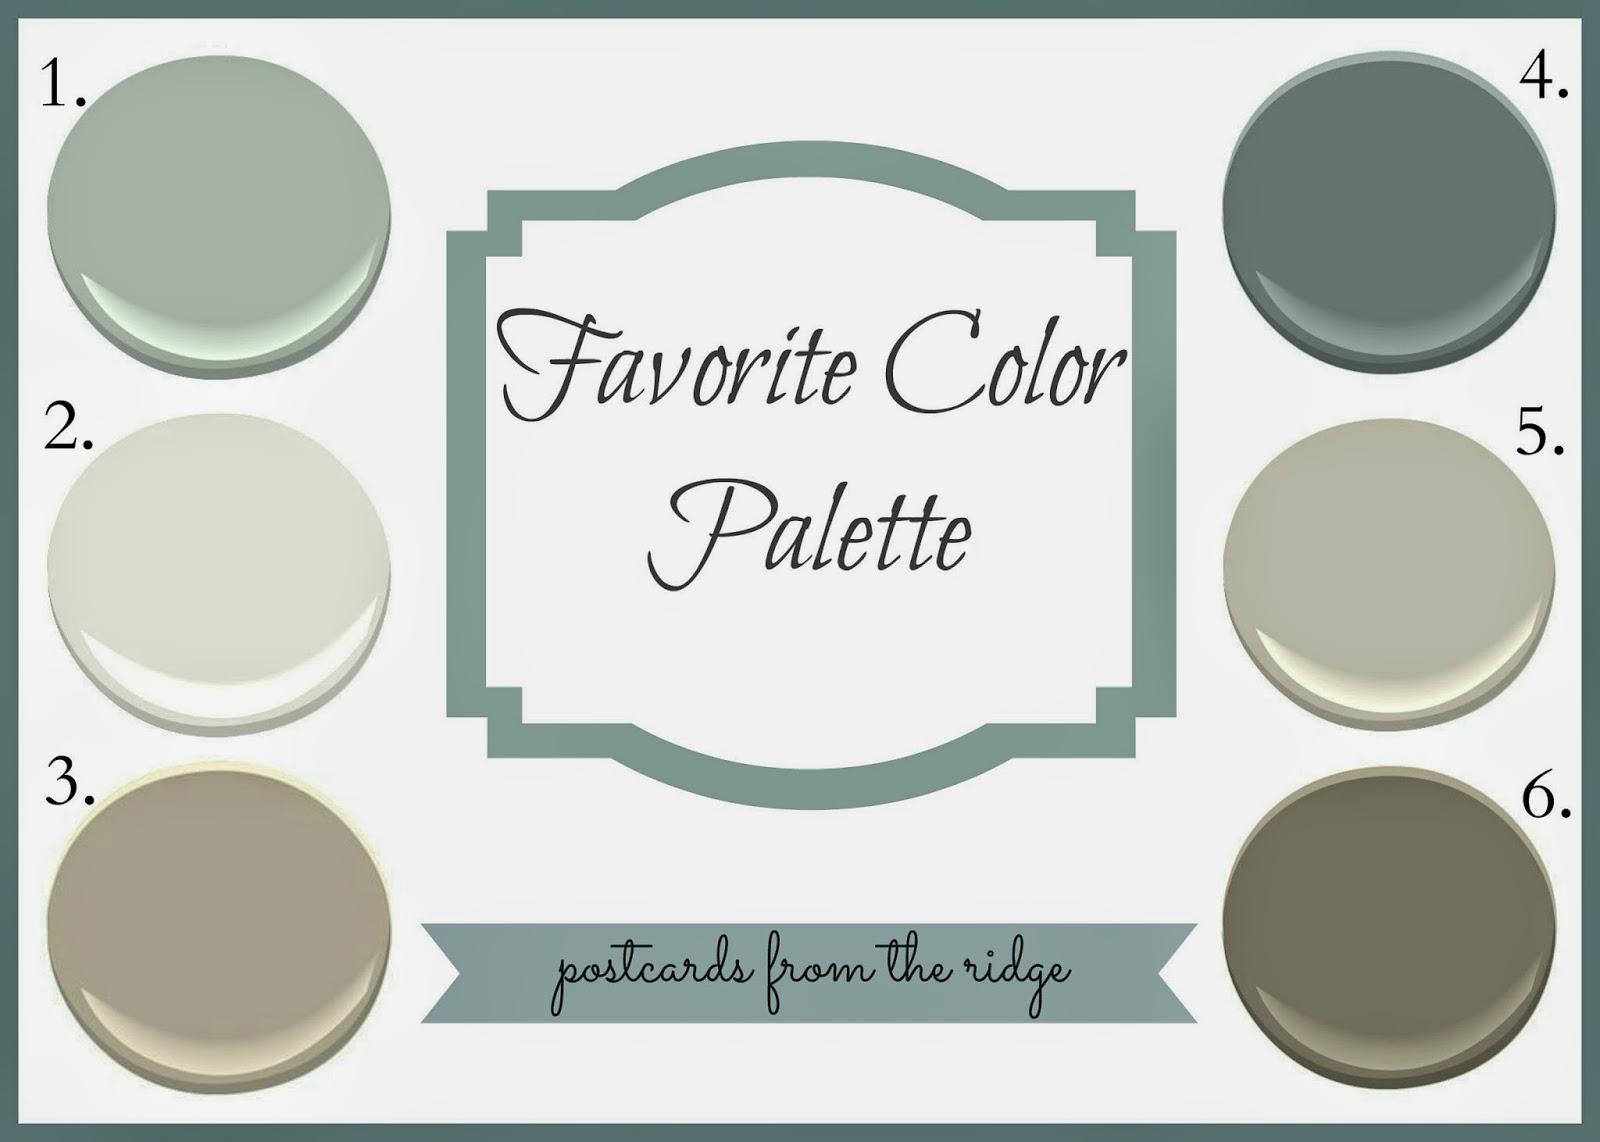 Revere Pewter Favorite Color Palette Postcards From